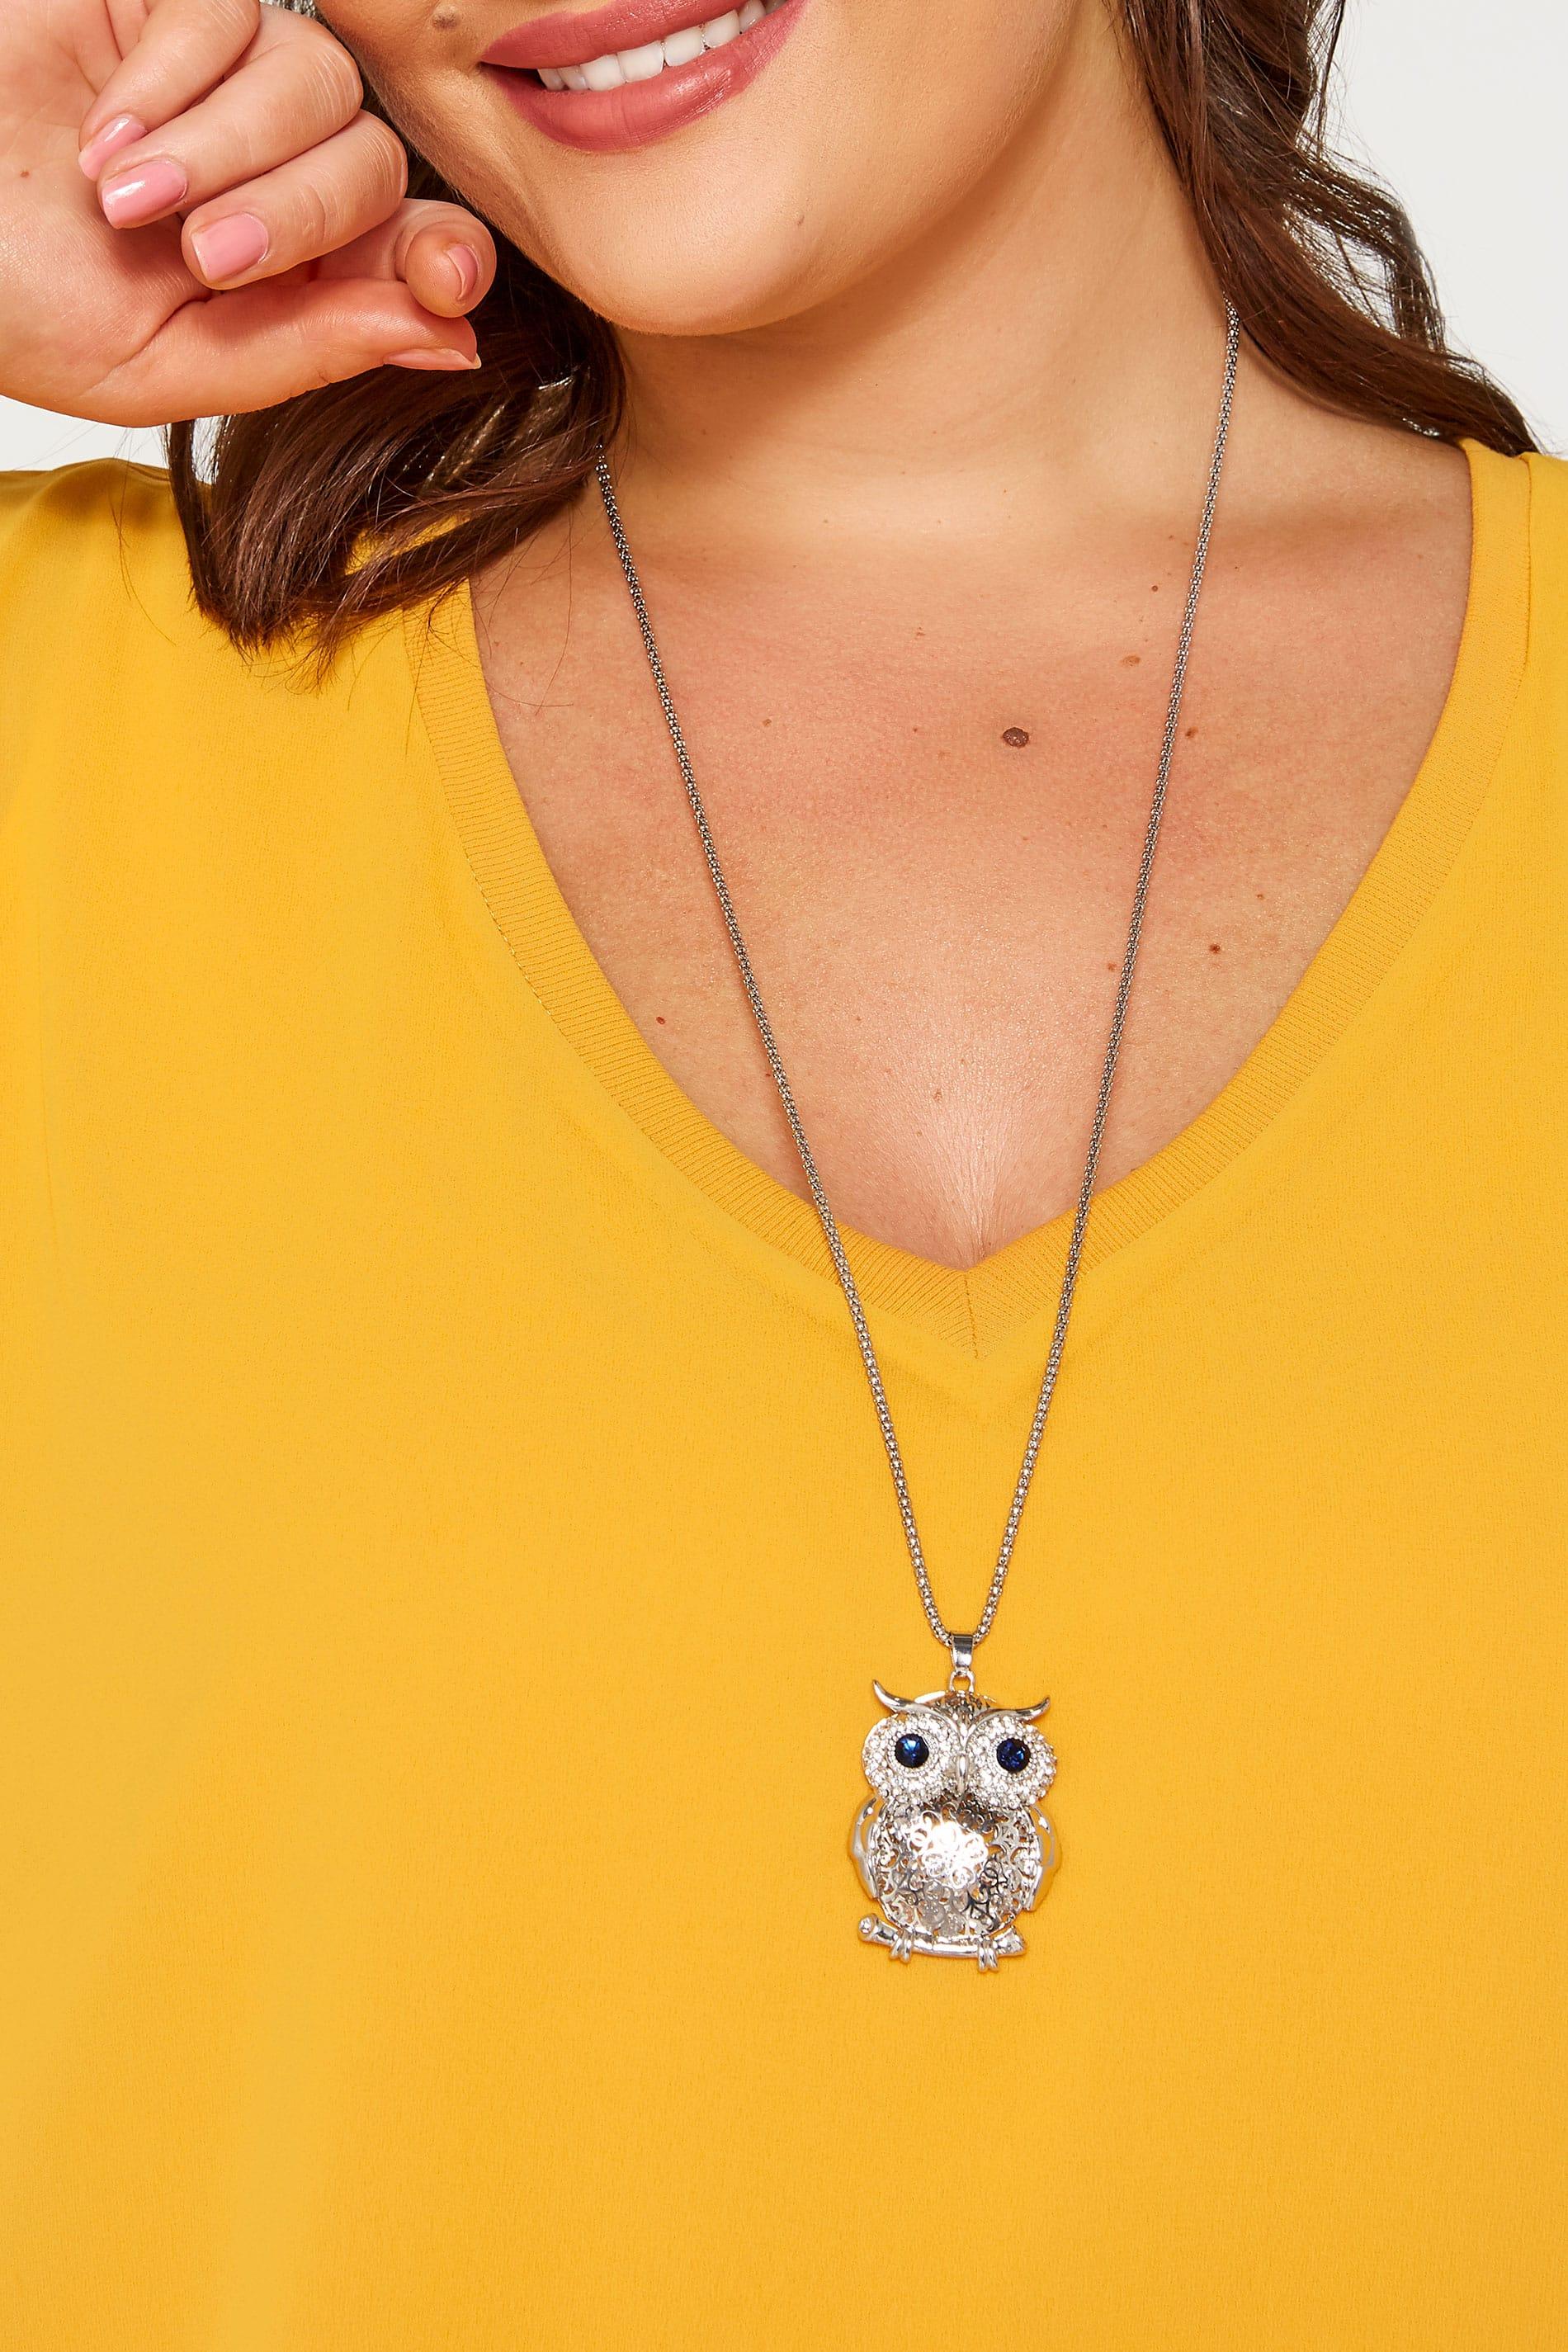 Silver Long Owl Pendant Necklace